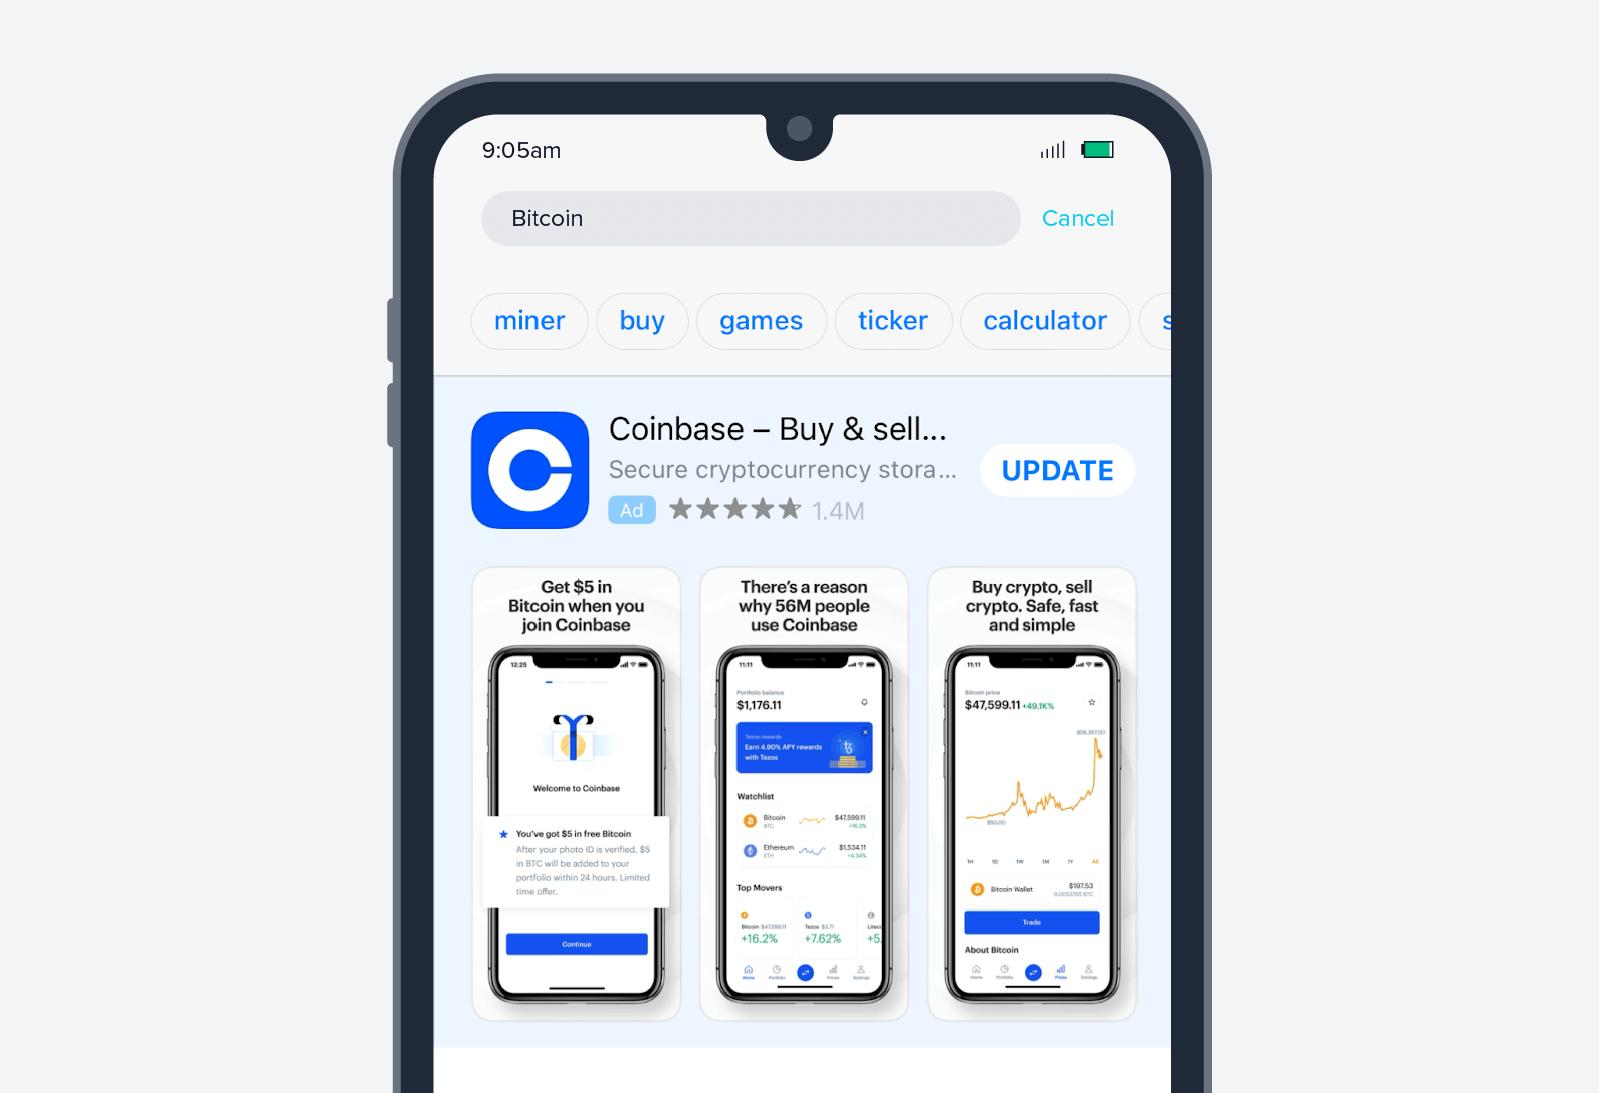 Coinbase app install ad